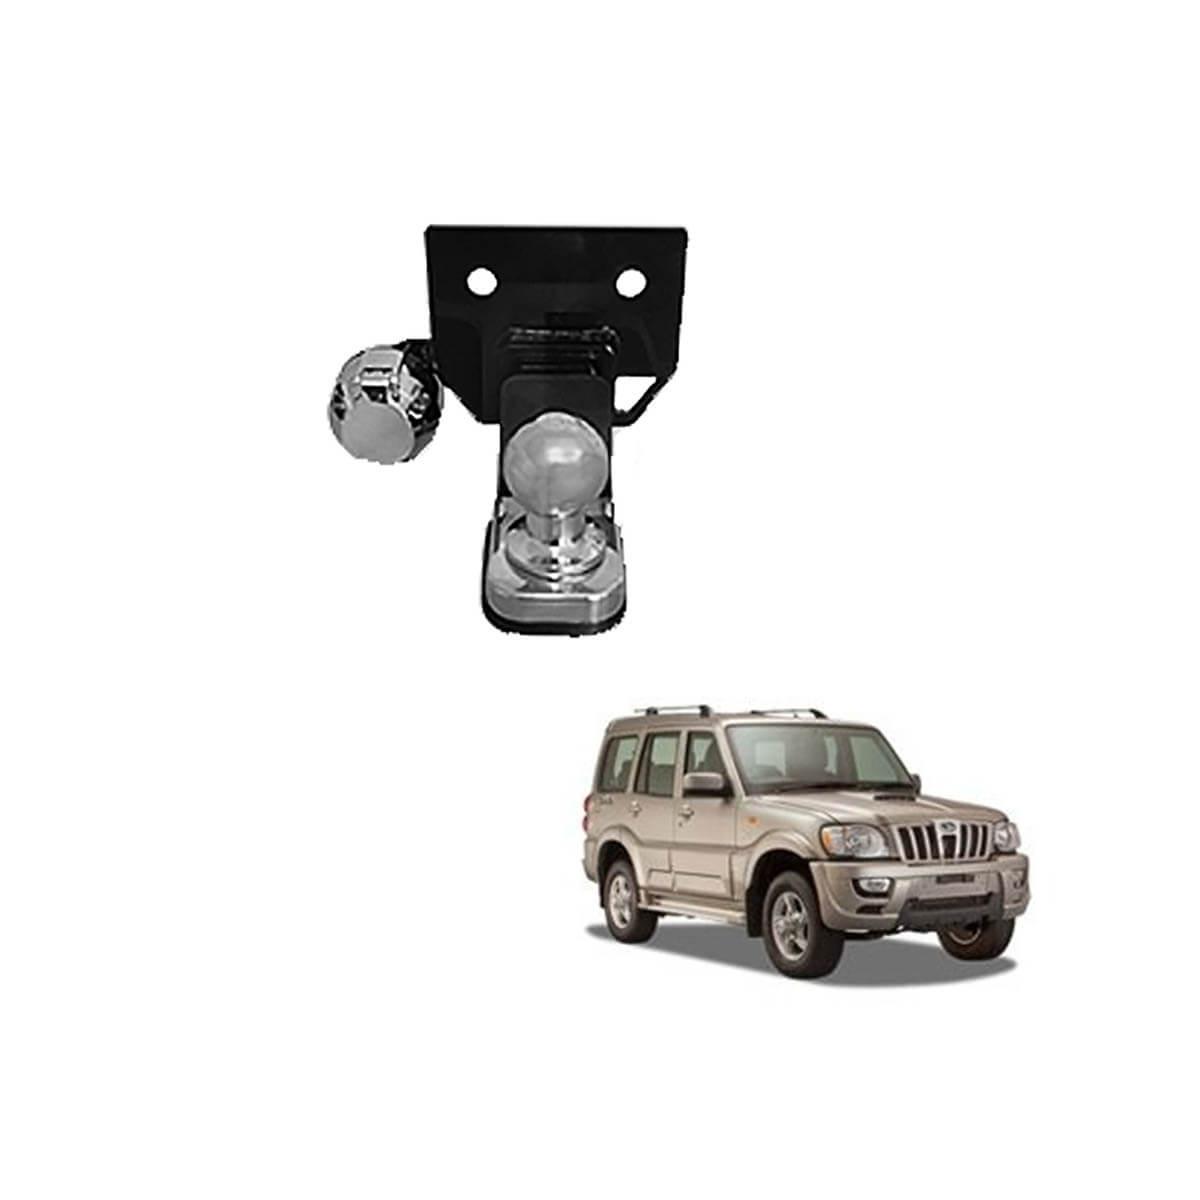 Engate de reboque Mahindra SUV 2008 a 2014 removível 1500 Kg